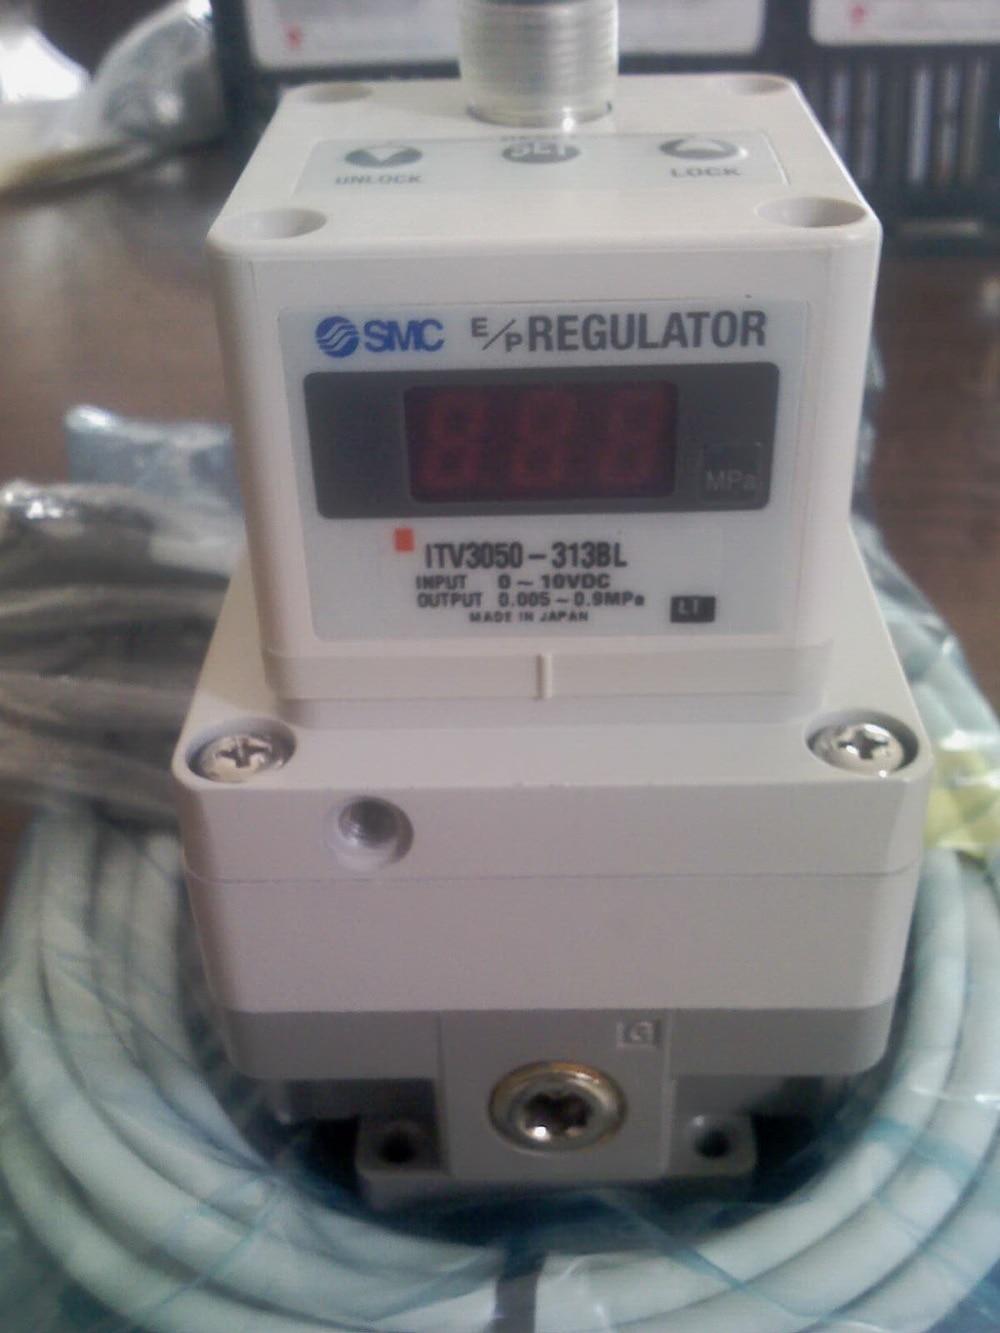 ITV3050-312L ELECTRO/PNEUMATIC REGULATOR, 24VDC Rc1/4 PORT NEW itv2030 312l electro pneumatic regulator 24vdc 1 4 port 0 10v input